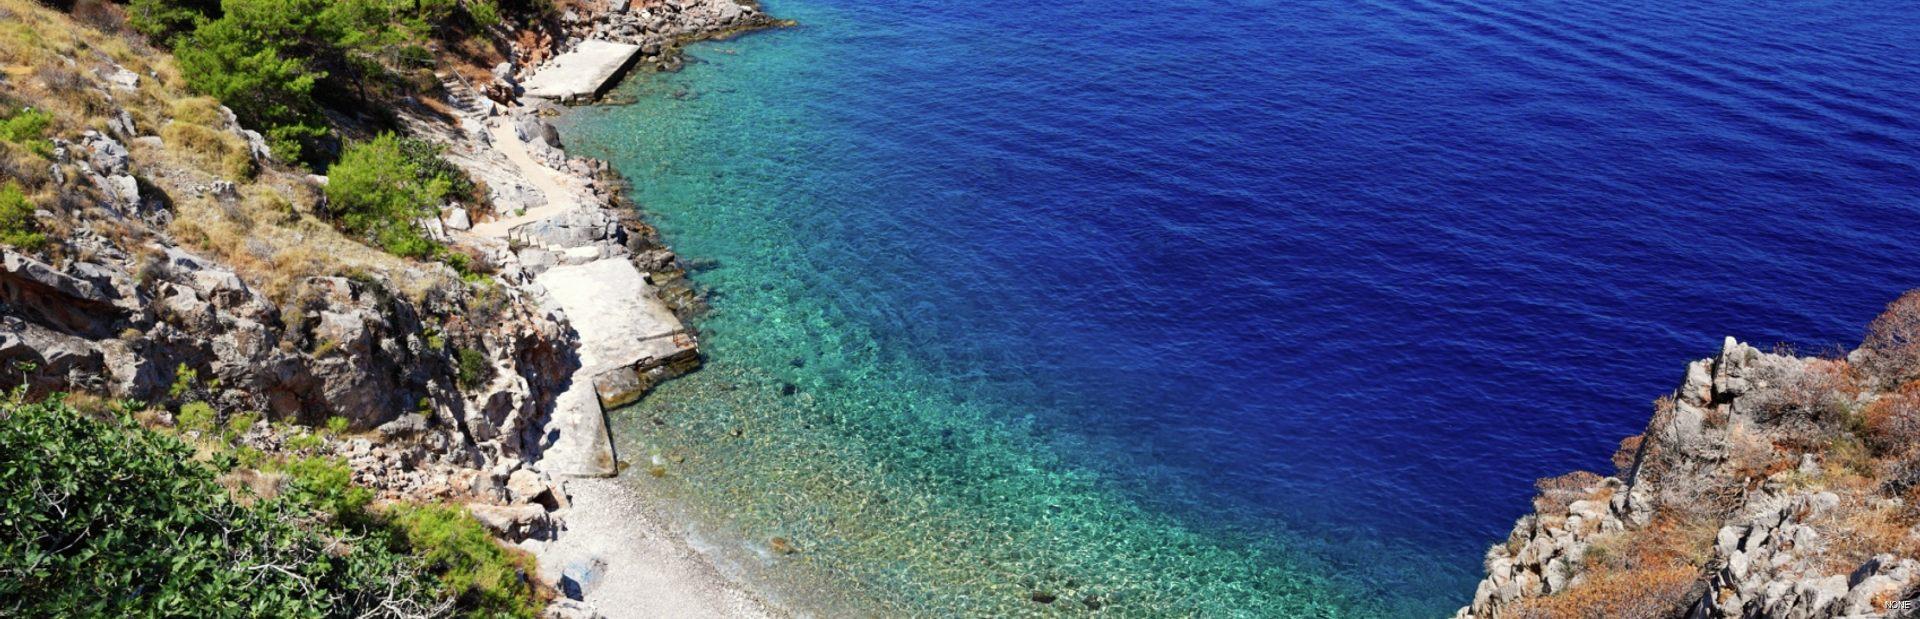 Saronic Islands photo tour